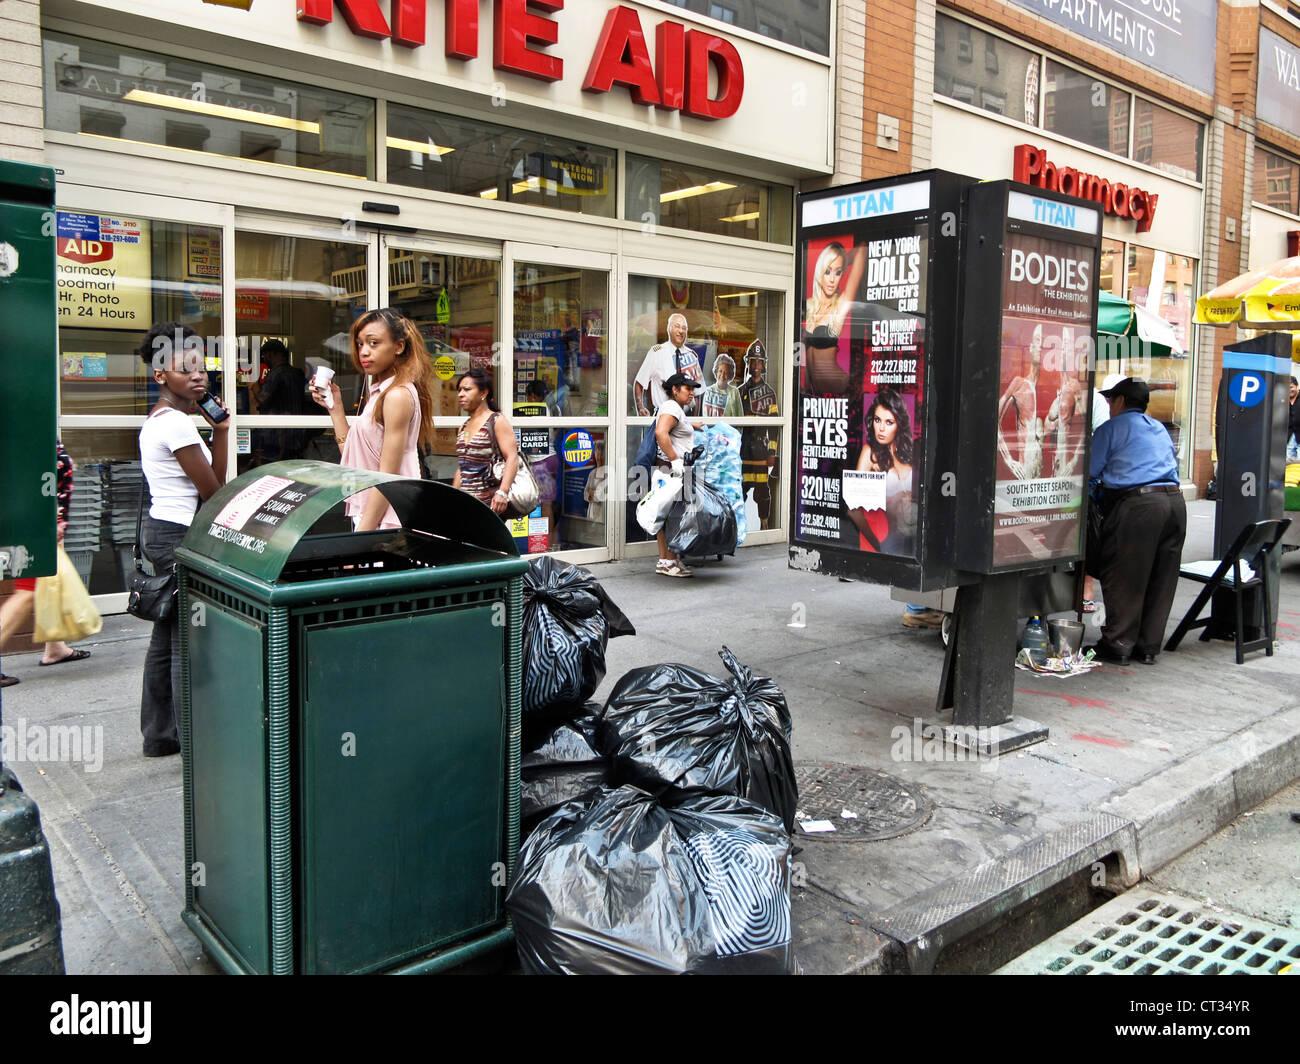 sidewalk street  scene busy 8th Avenue corner on a hot summer day in midtown Manhattan New York City - Stock Image